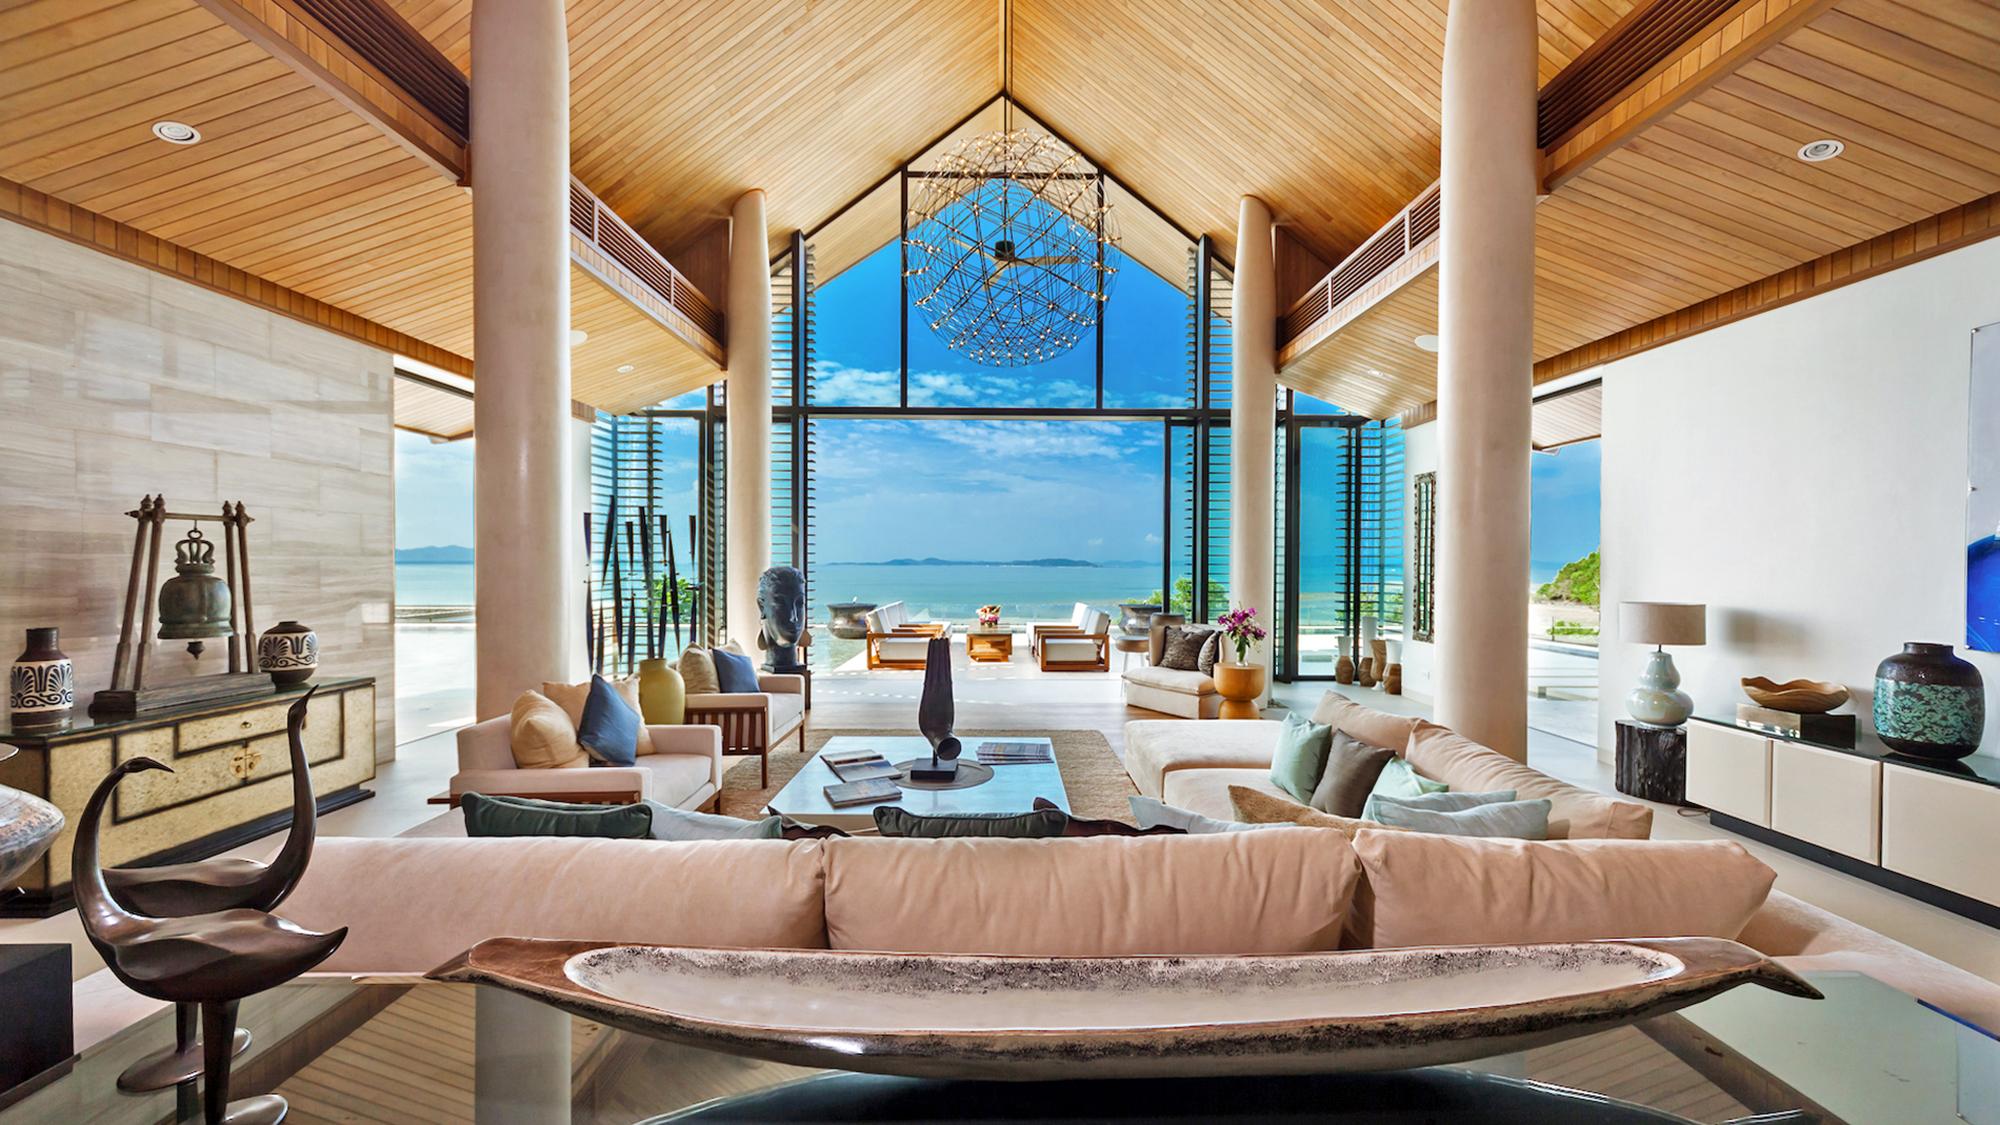 Luxury Retreats: Luxury Retreats Blurring The Lines: Travel Weekly